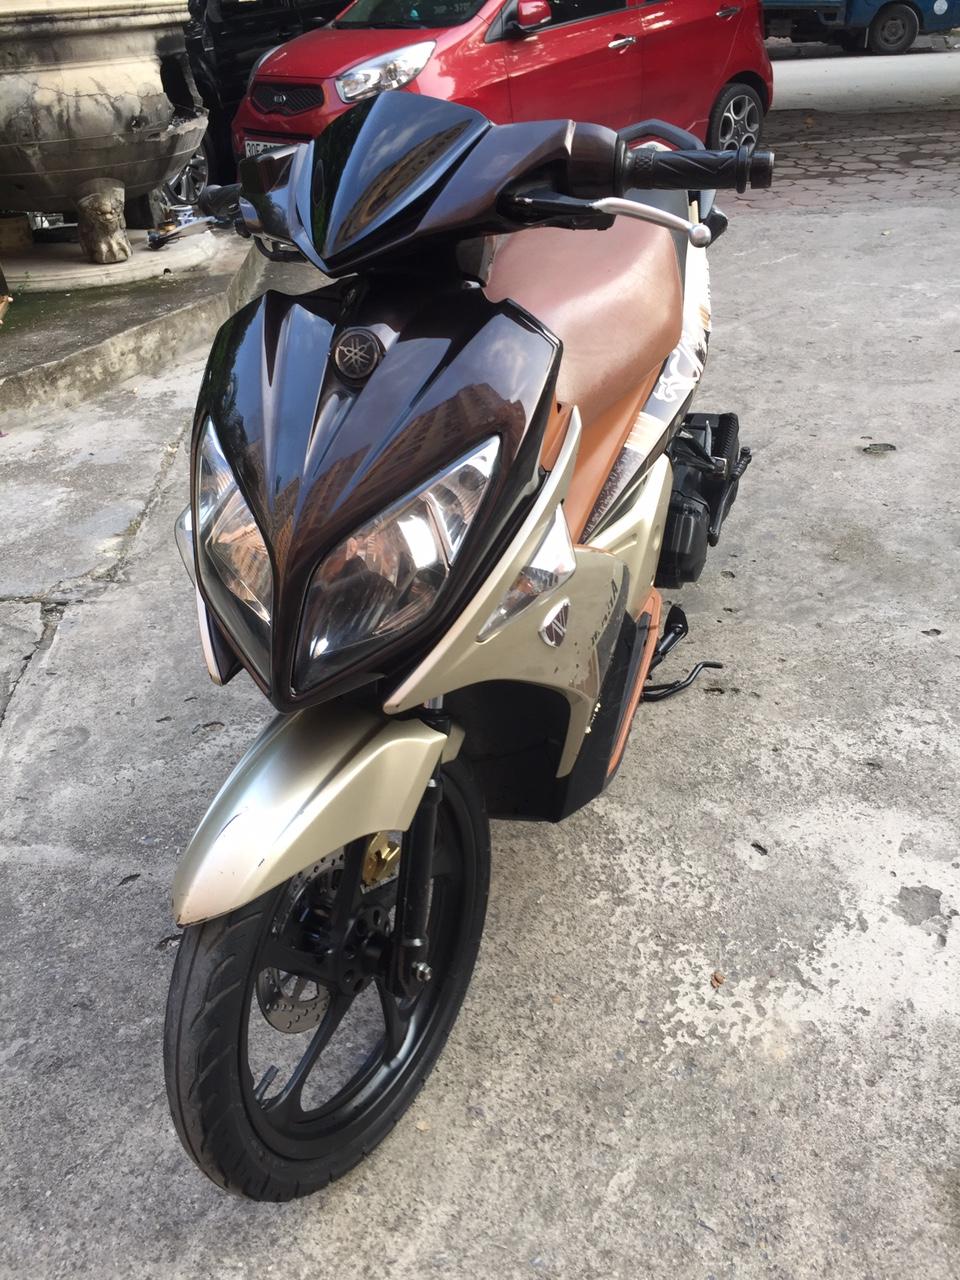 Rao ban xe Yamaha Nouvolx 135 Nau rat moi may chay cuc phe - 2